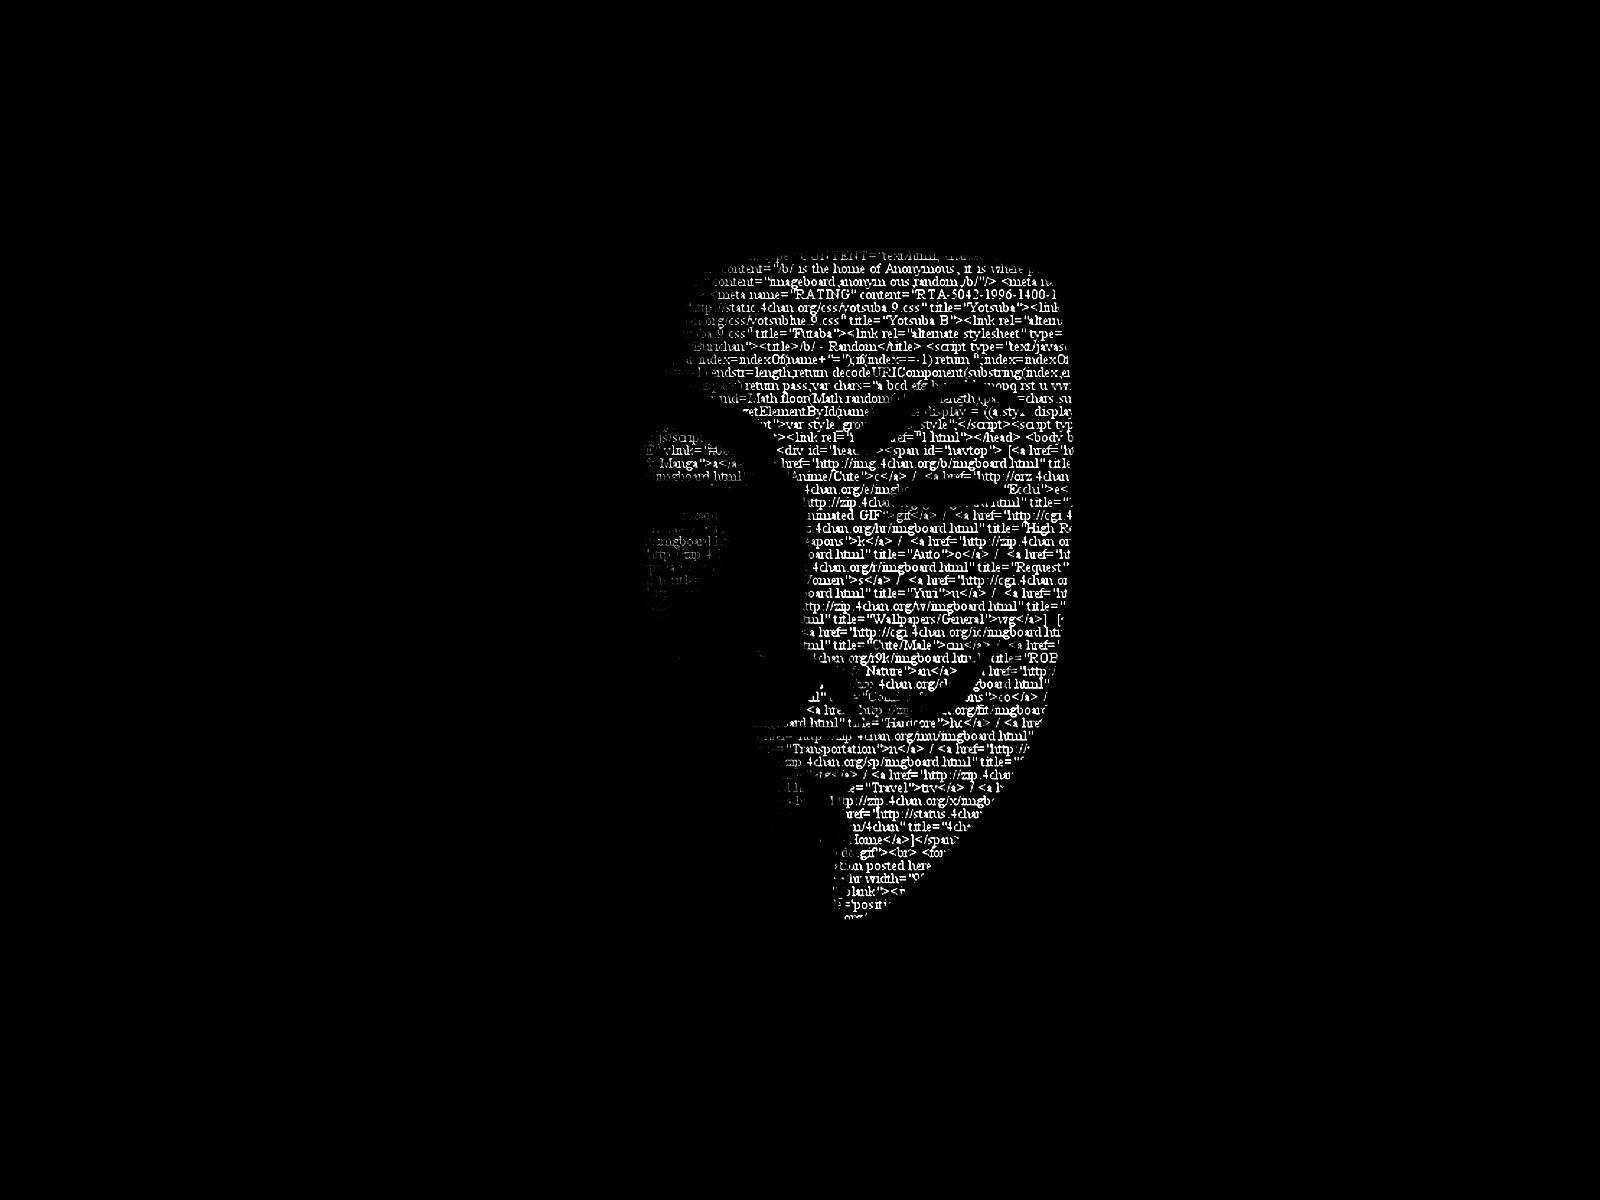 37 Programmer Code Wallpaper Backgrounds Download 1600x1200